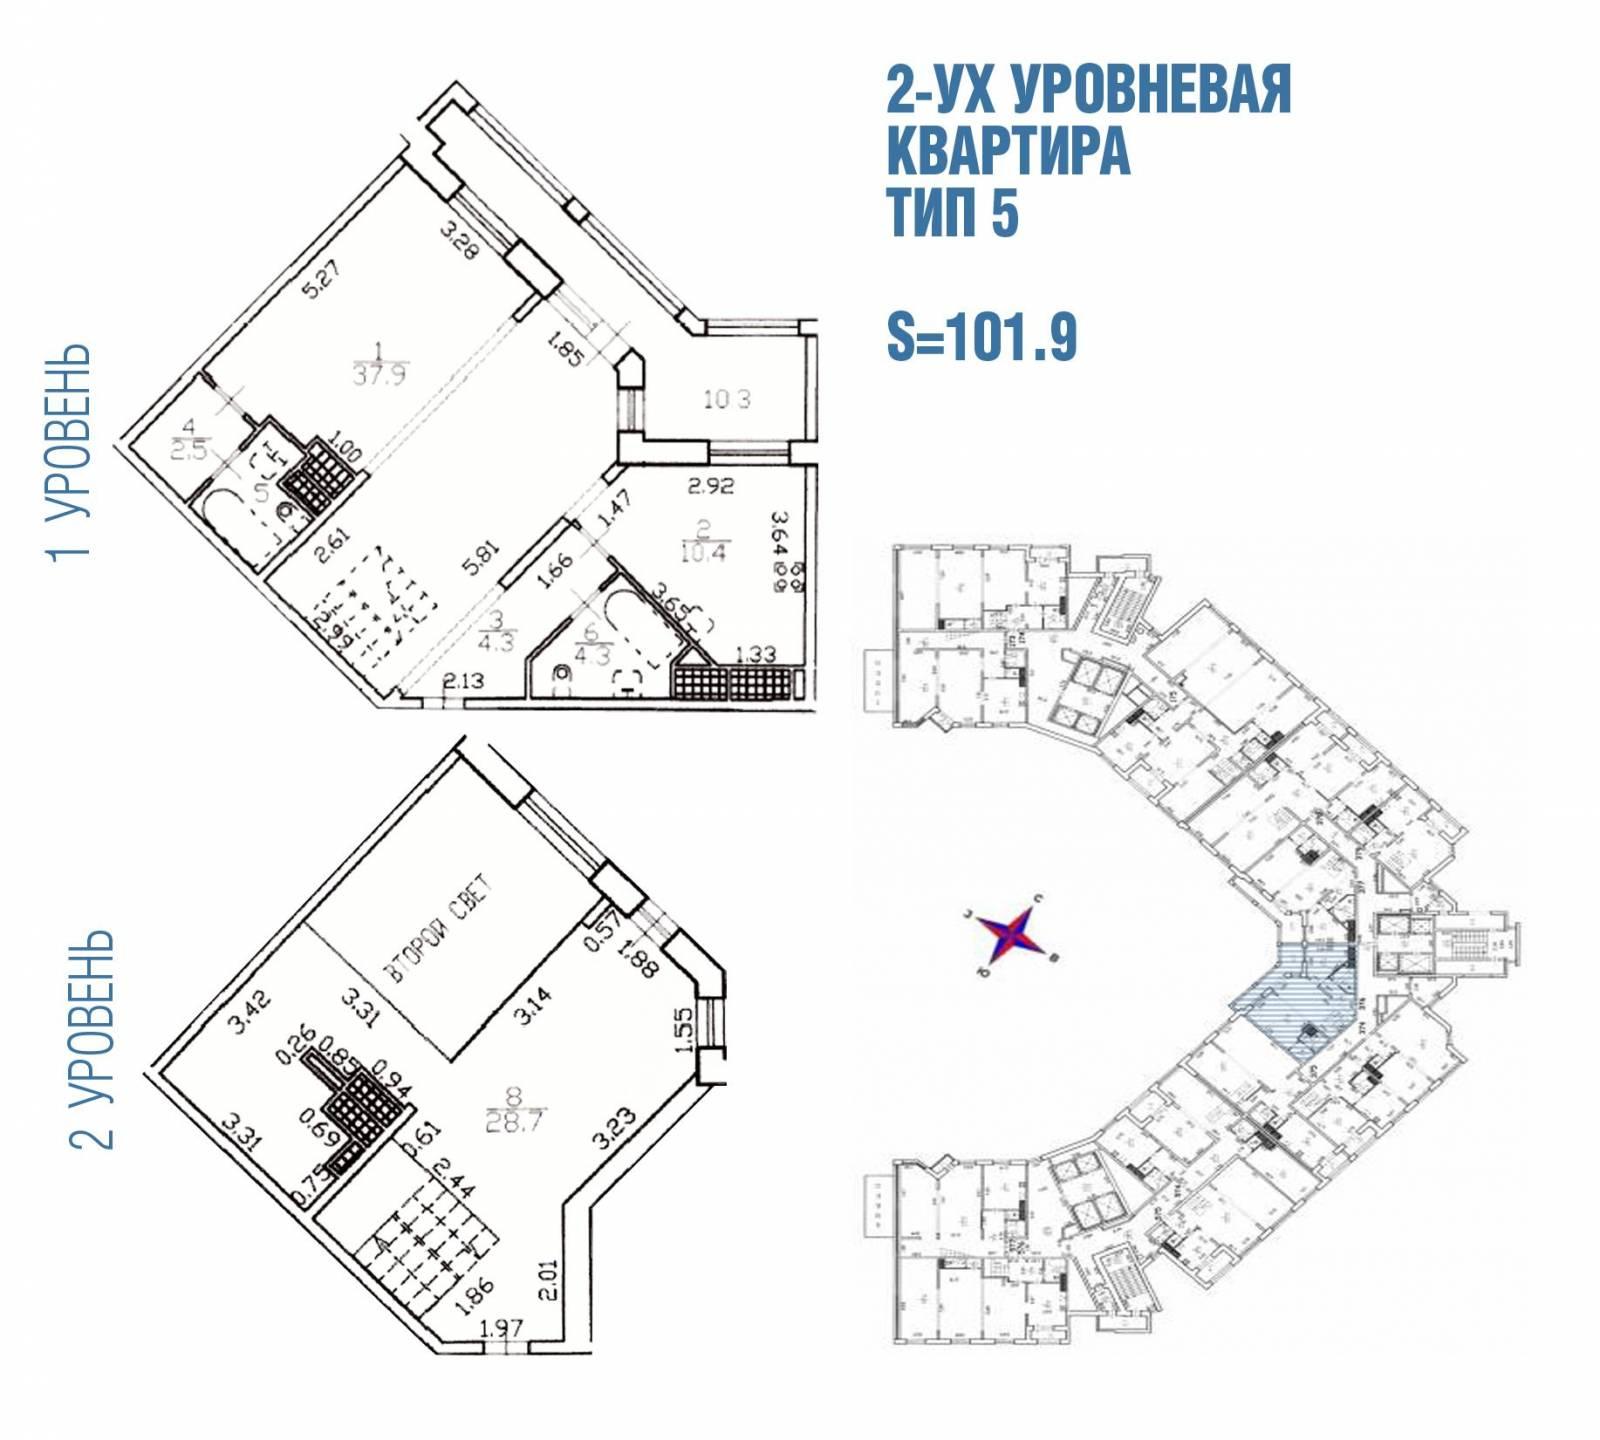 Двухуровневая квартира тип 5 S=101,9